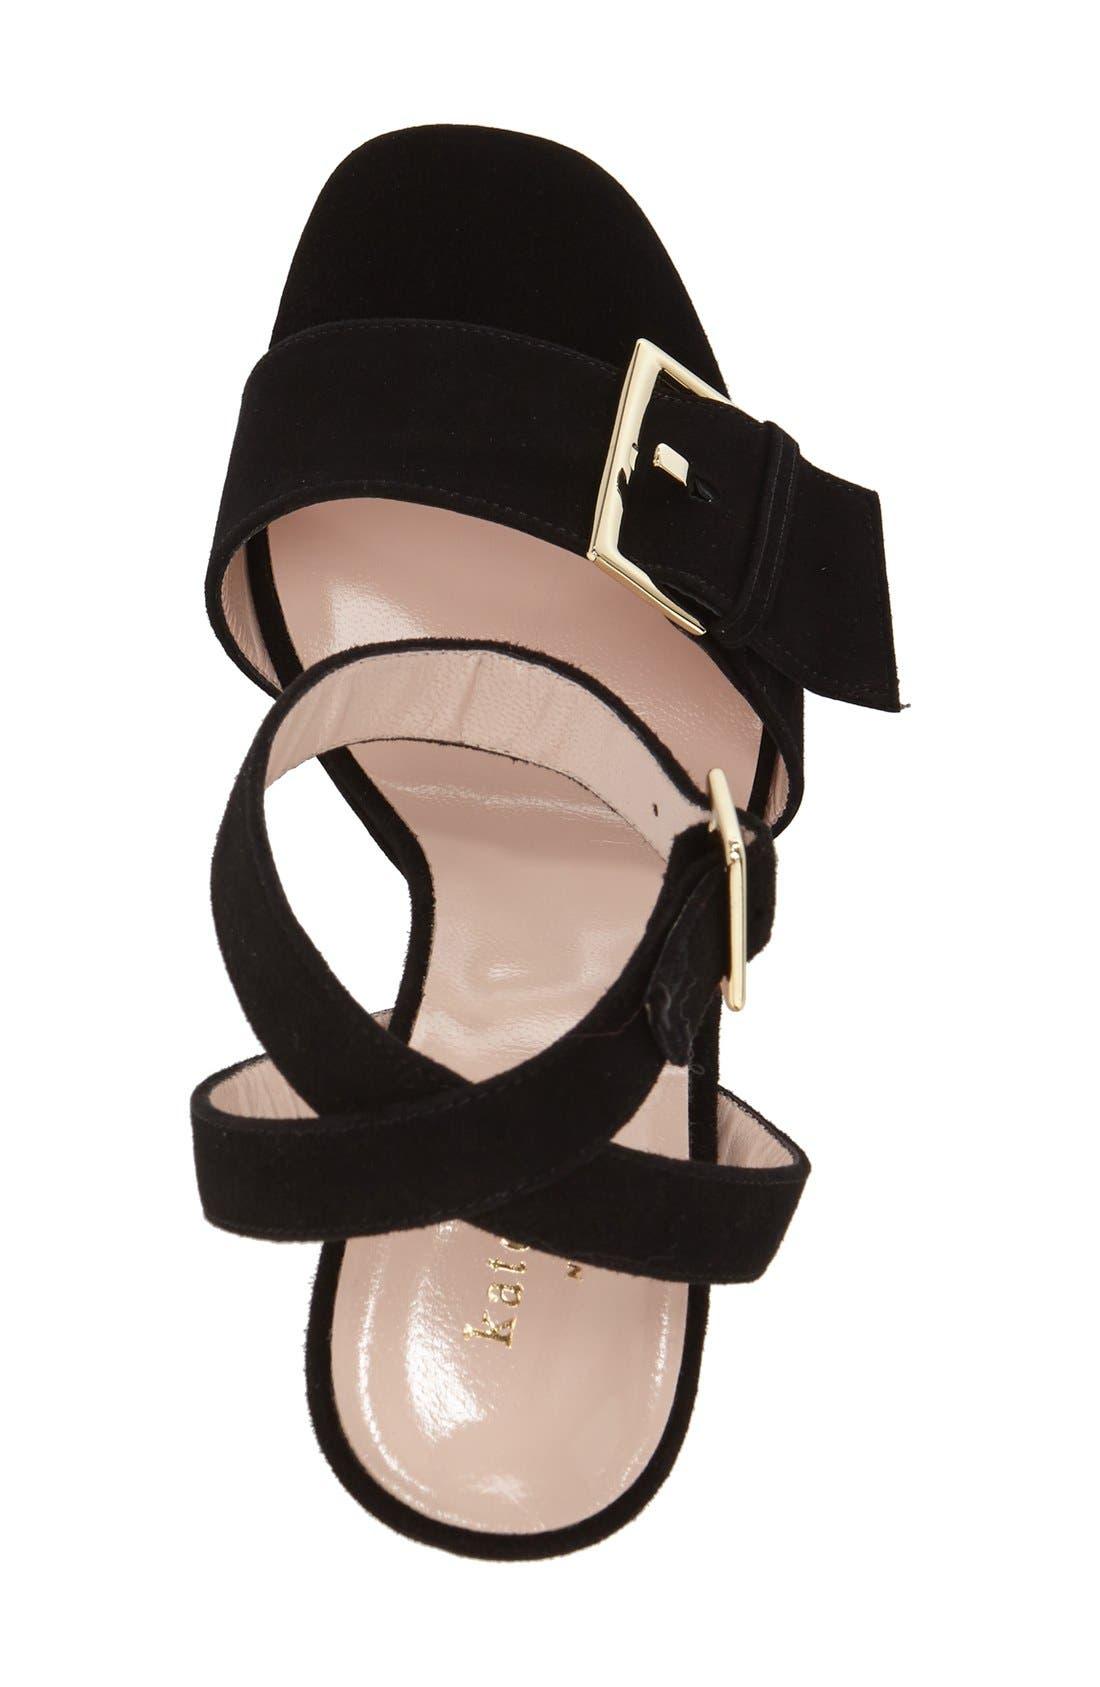 Alternate Image 3  - kate spade new york 'breeze' sandal (Women)